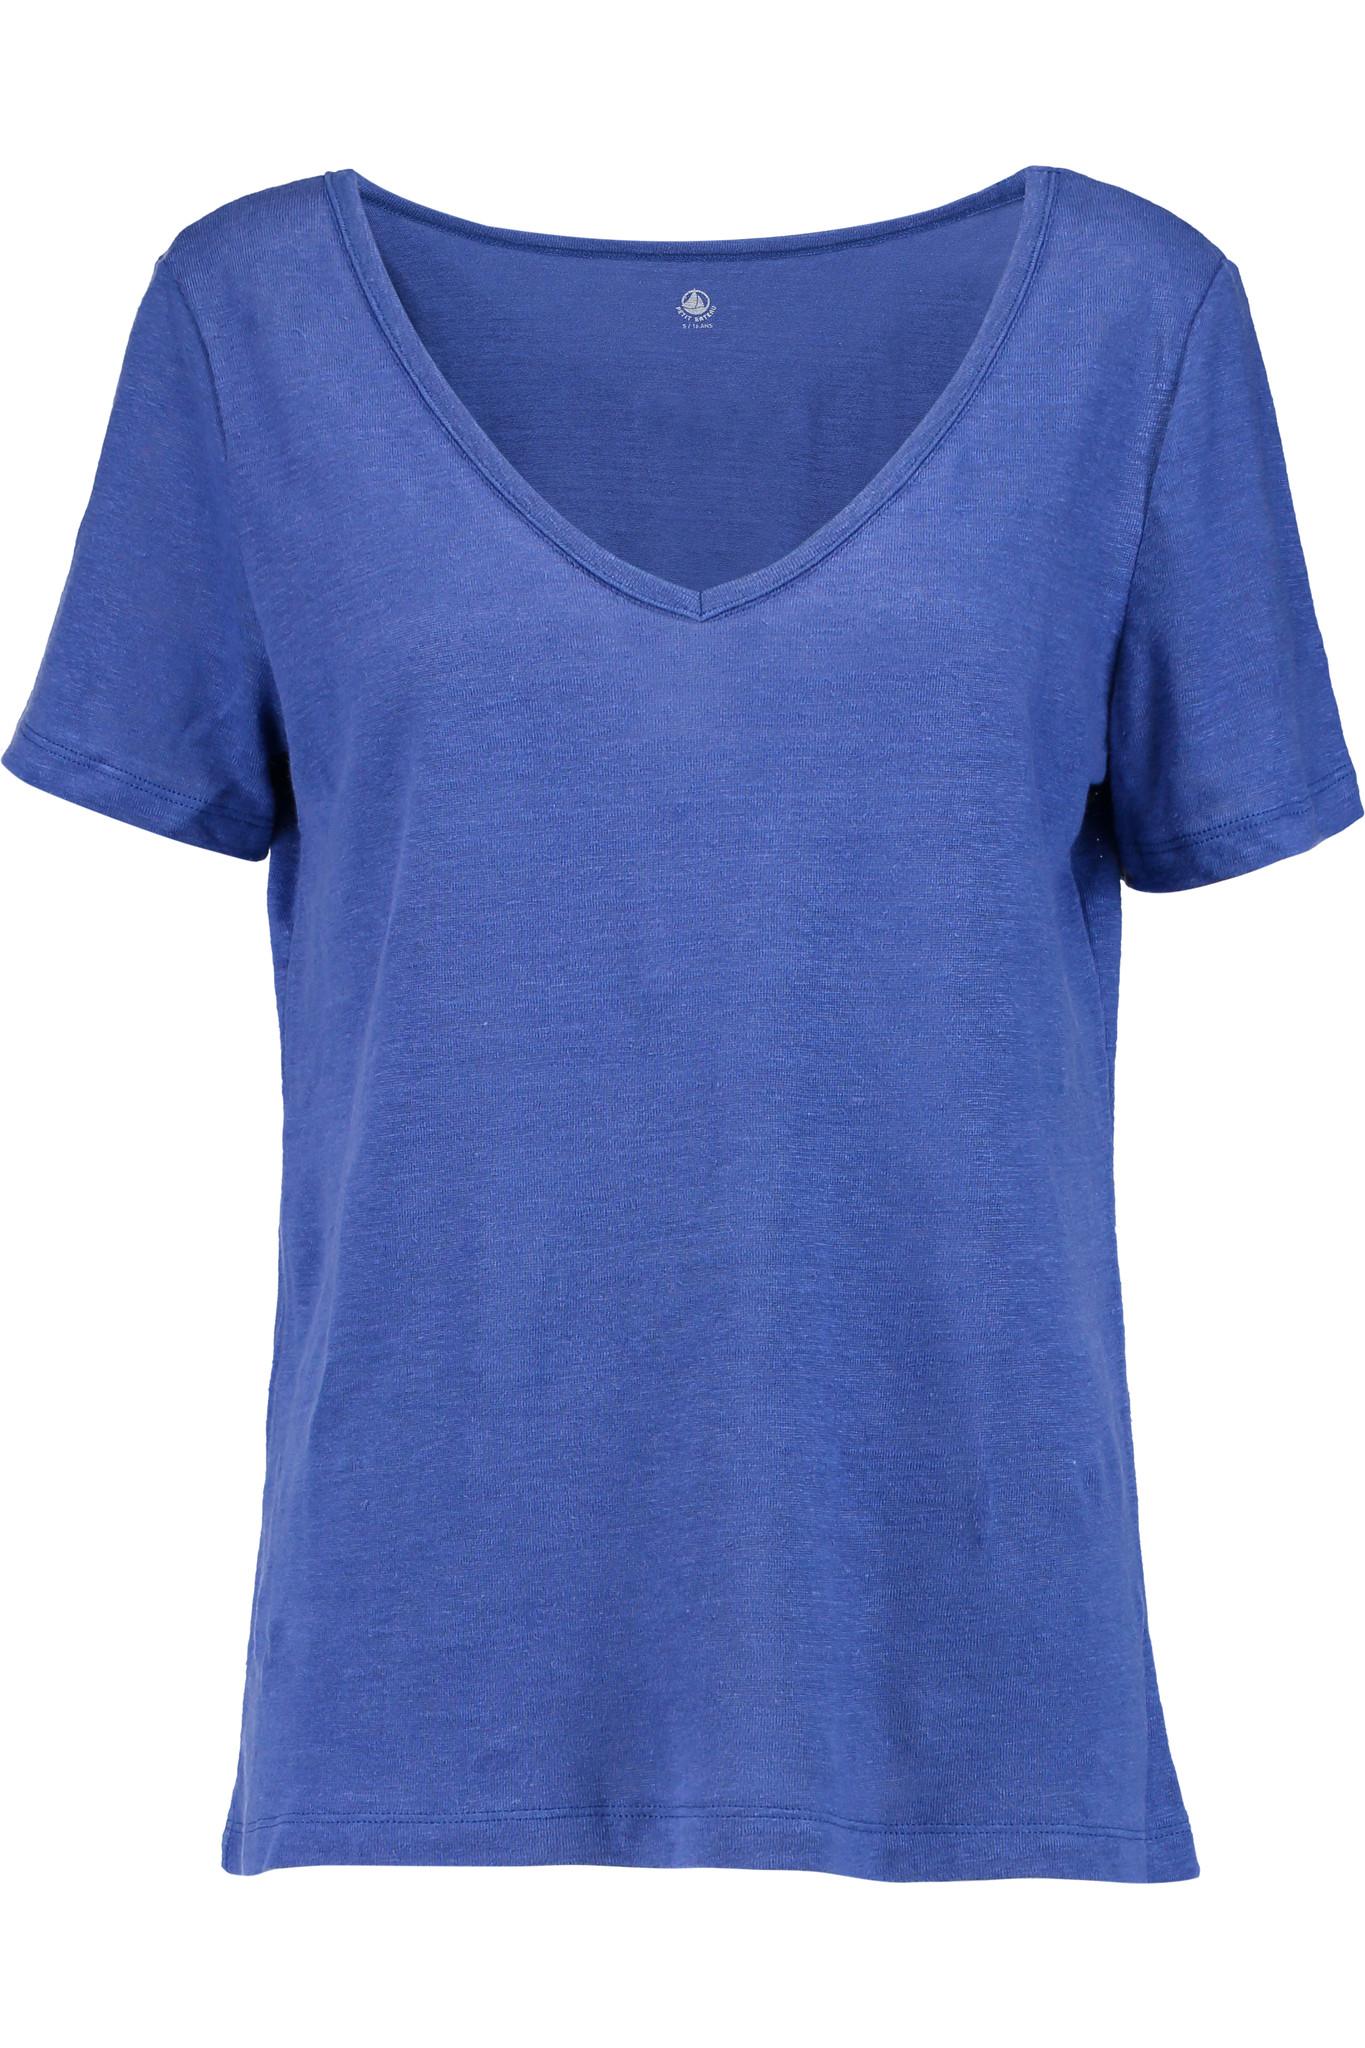 petit bateau slub linen t shirt in blue lyst. Black Bedroom Furniture Sets. Home Design Ideas